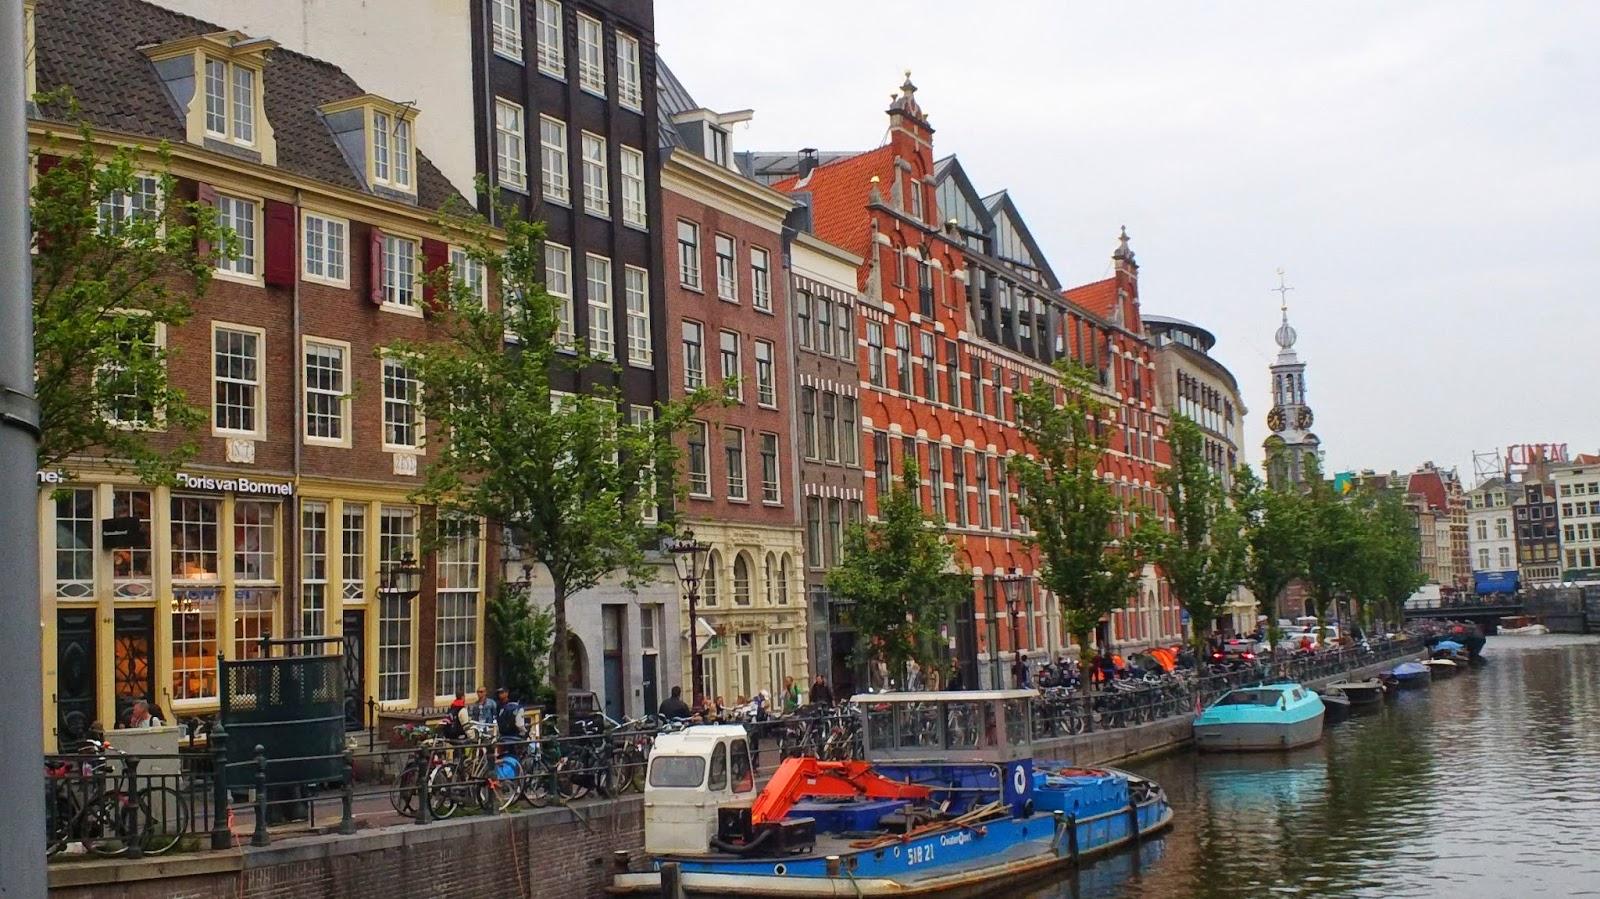 nomdeplume 5 giorni ad amsterdam in video